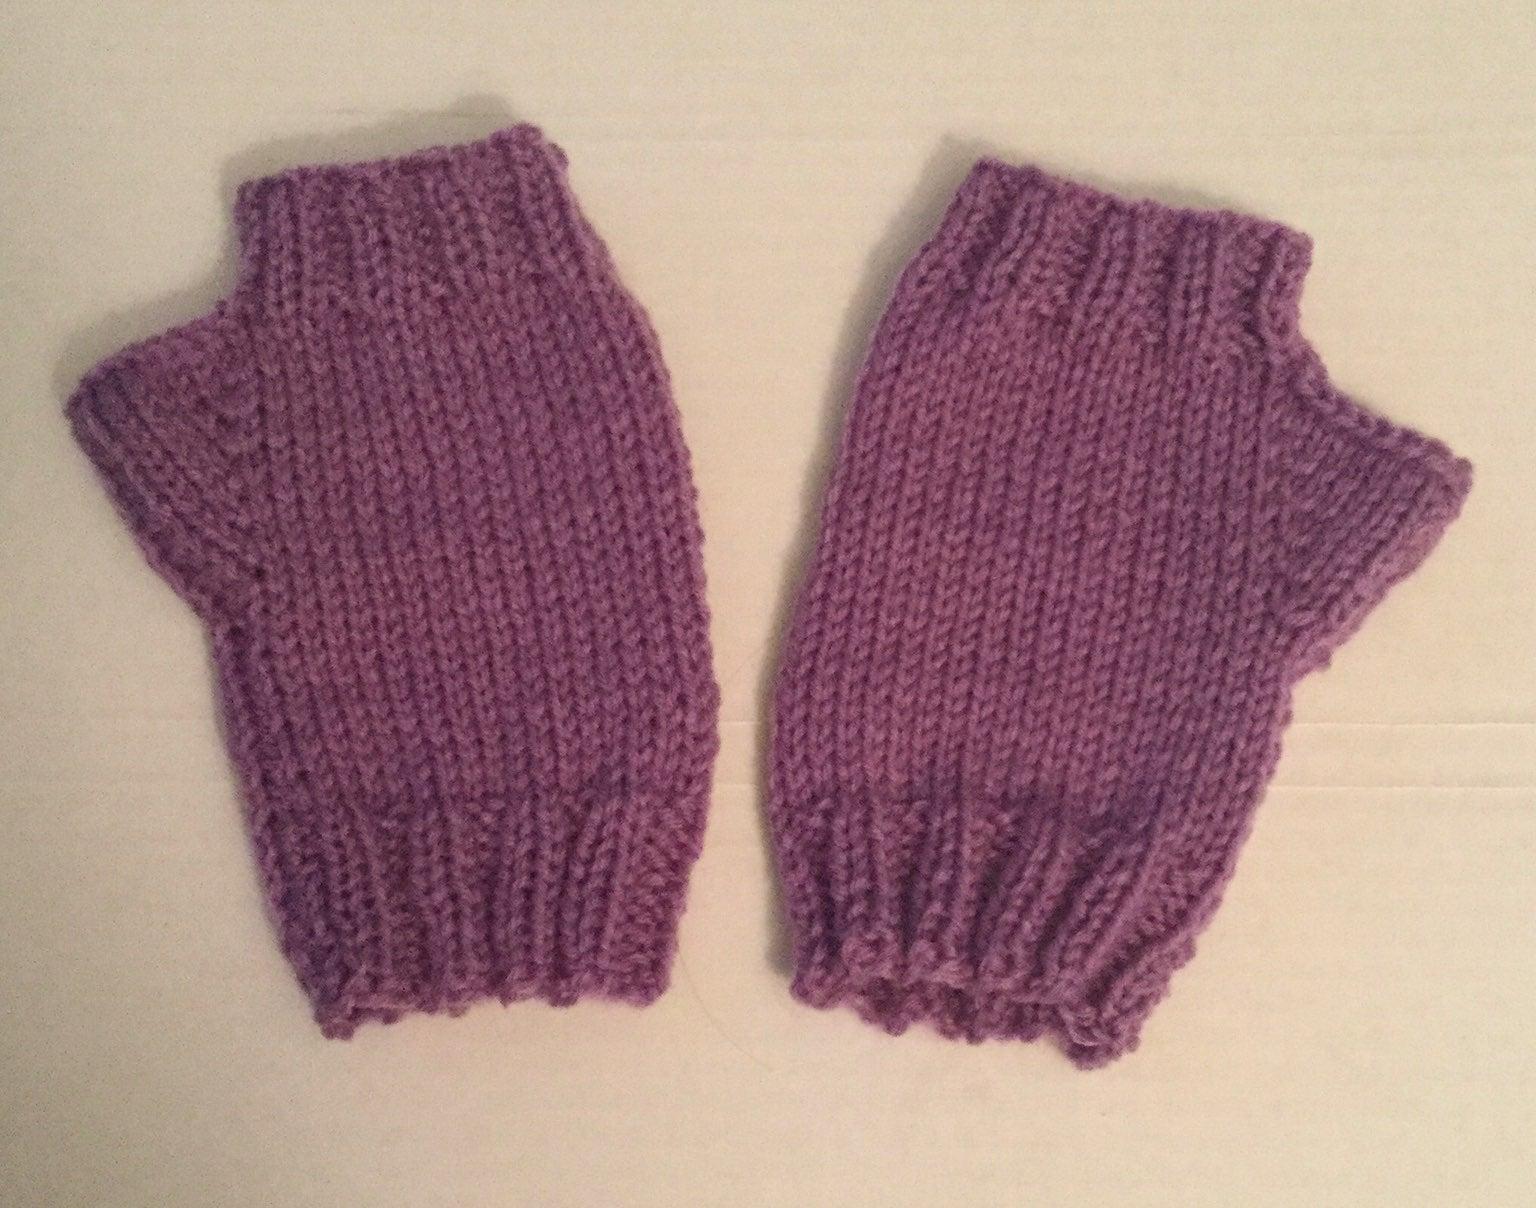 Small/ medium fingerless hand mitts, adu